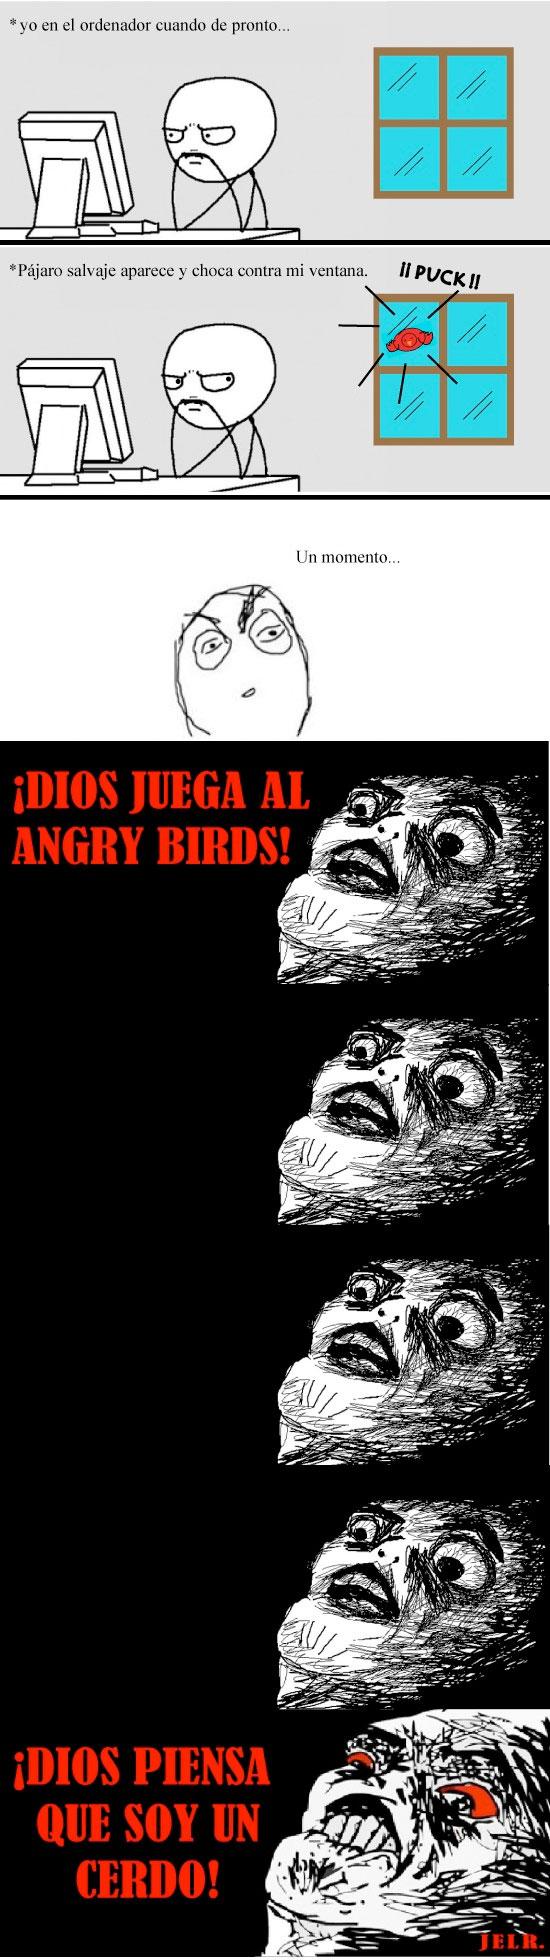 angry,birds,cerdo,dios,divierte,guy,inglip,pc,raisins